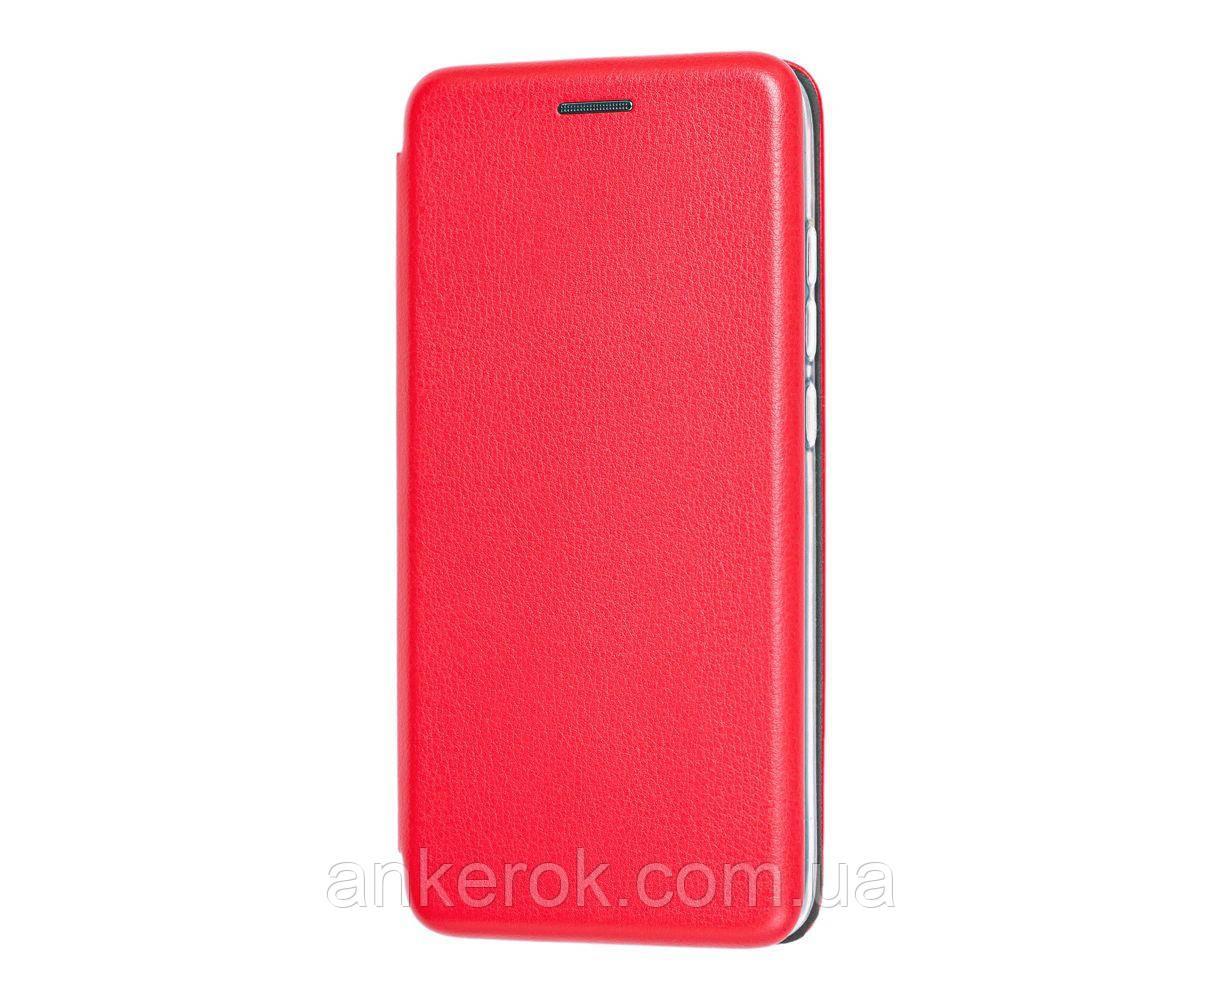 Чохол-книжка для Xiaomi Redmi 7a (Red)